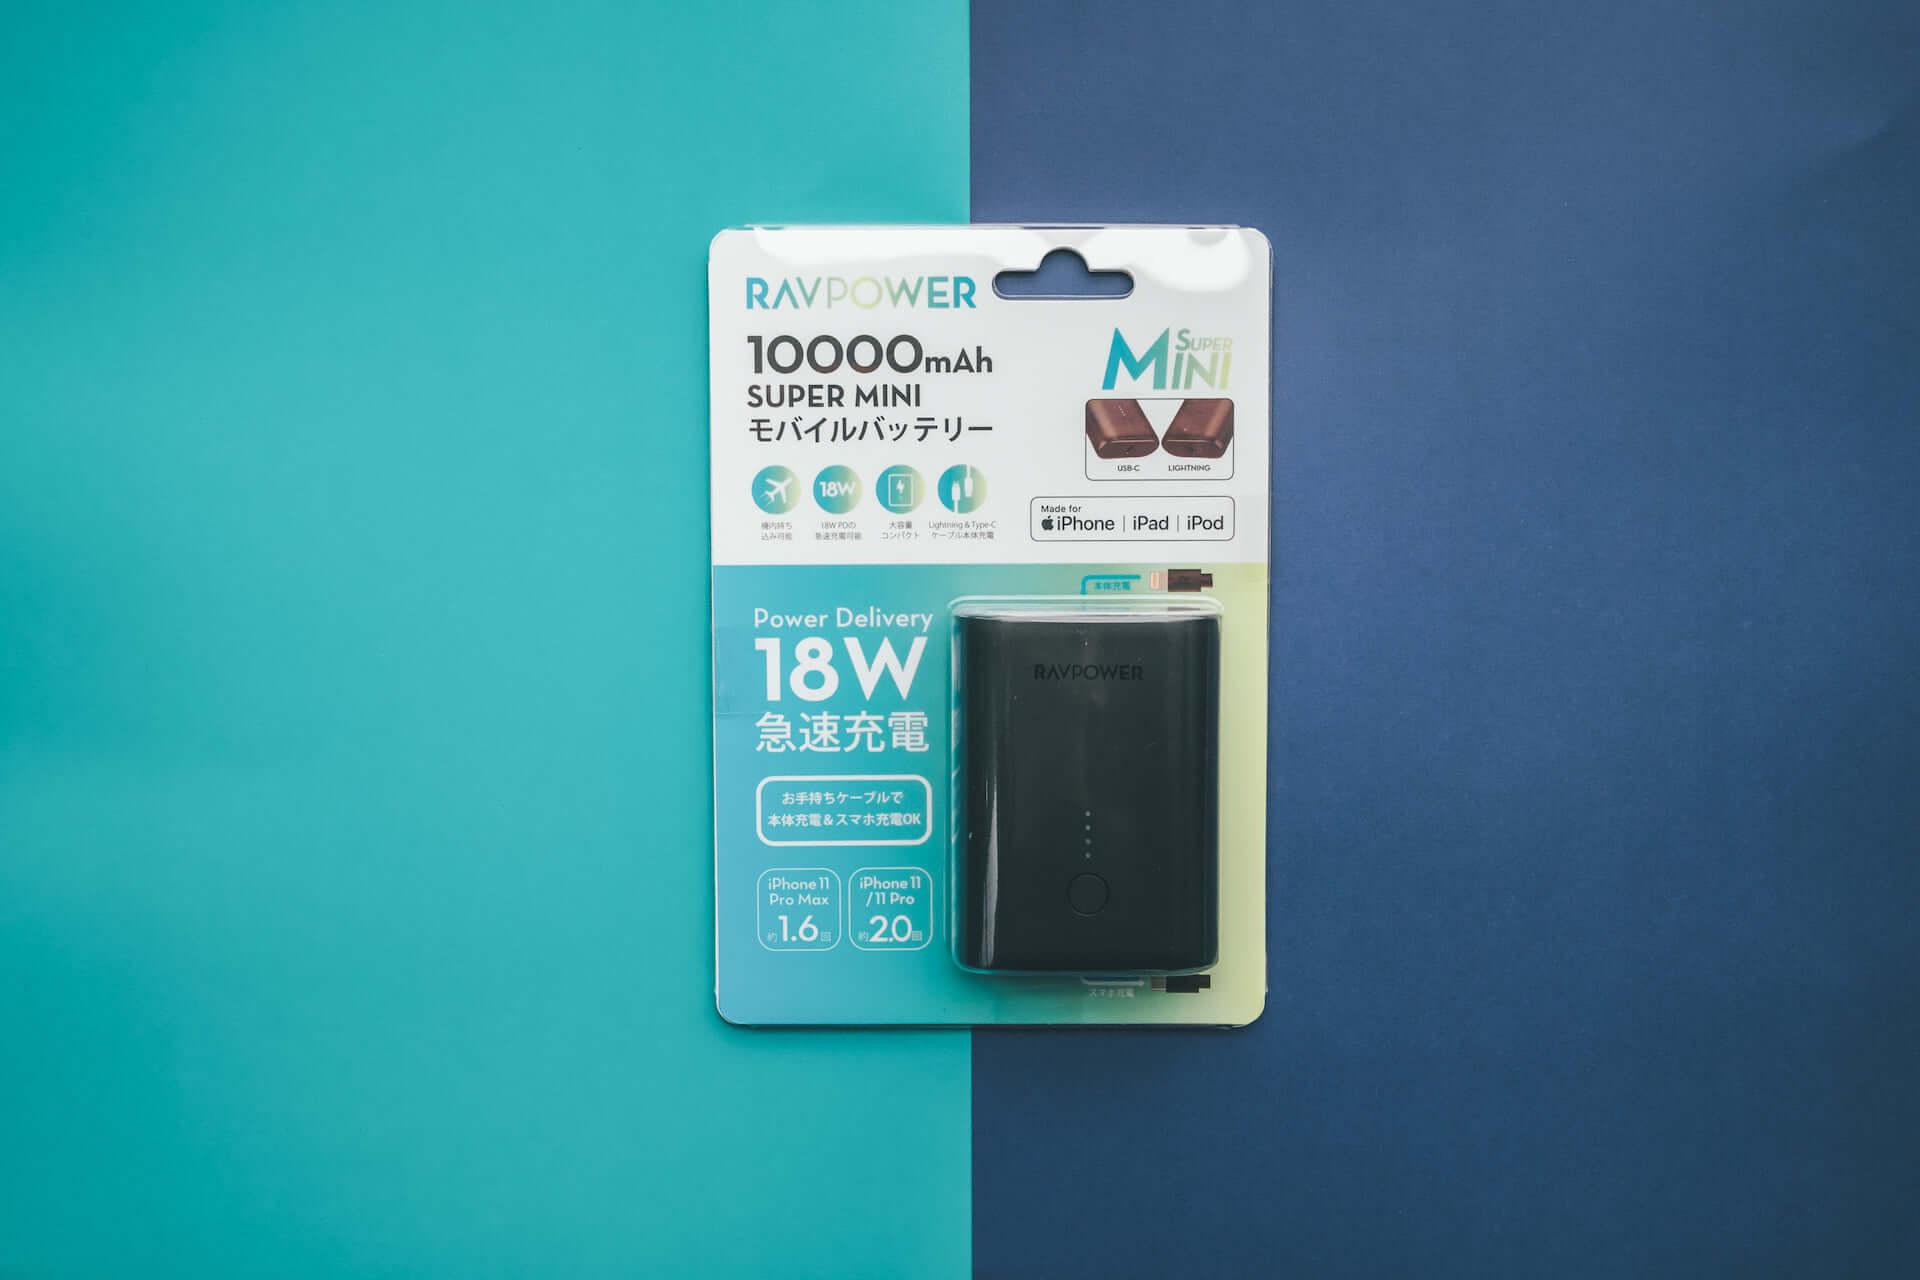 10000mAhの大容量モバイルバッテリーがRAVPowerから発売中!名刺入れやカードよりも小さいサイズ tech200727_ravpower_08-1920x1280